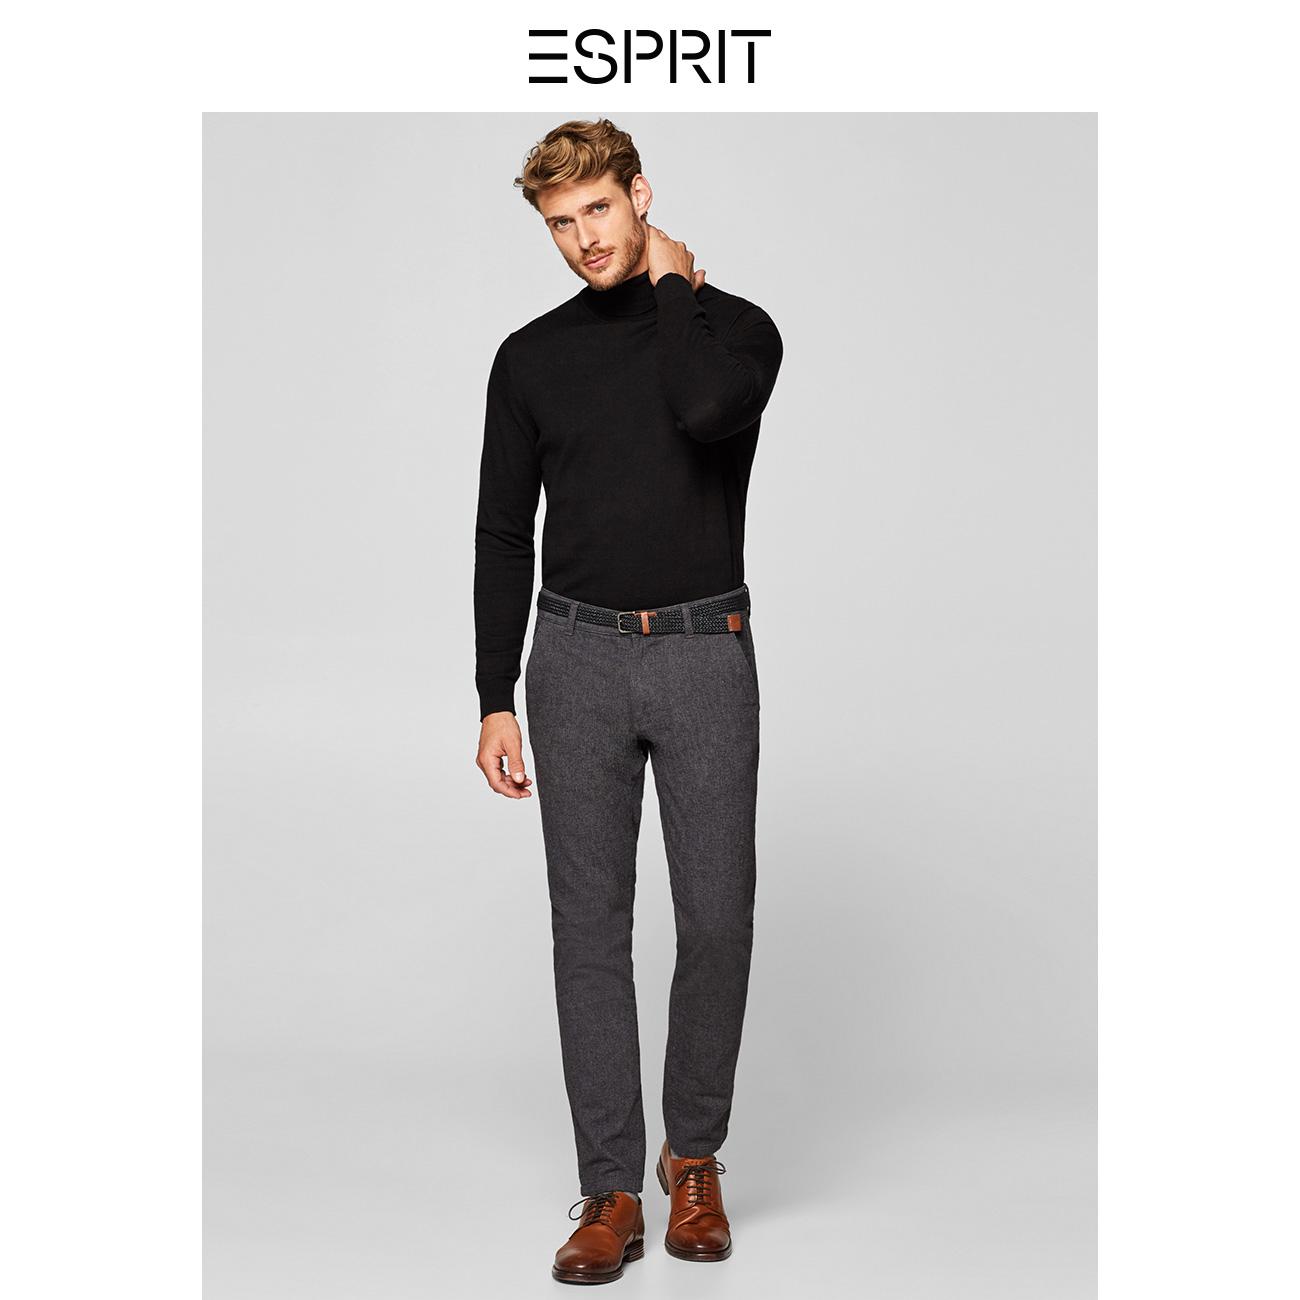 ESPRIT商场同款商务休闲裤男装含腰带直筒长裤冬-108EE2B003